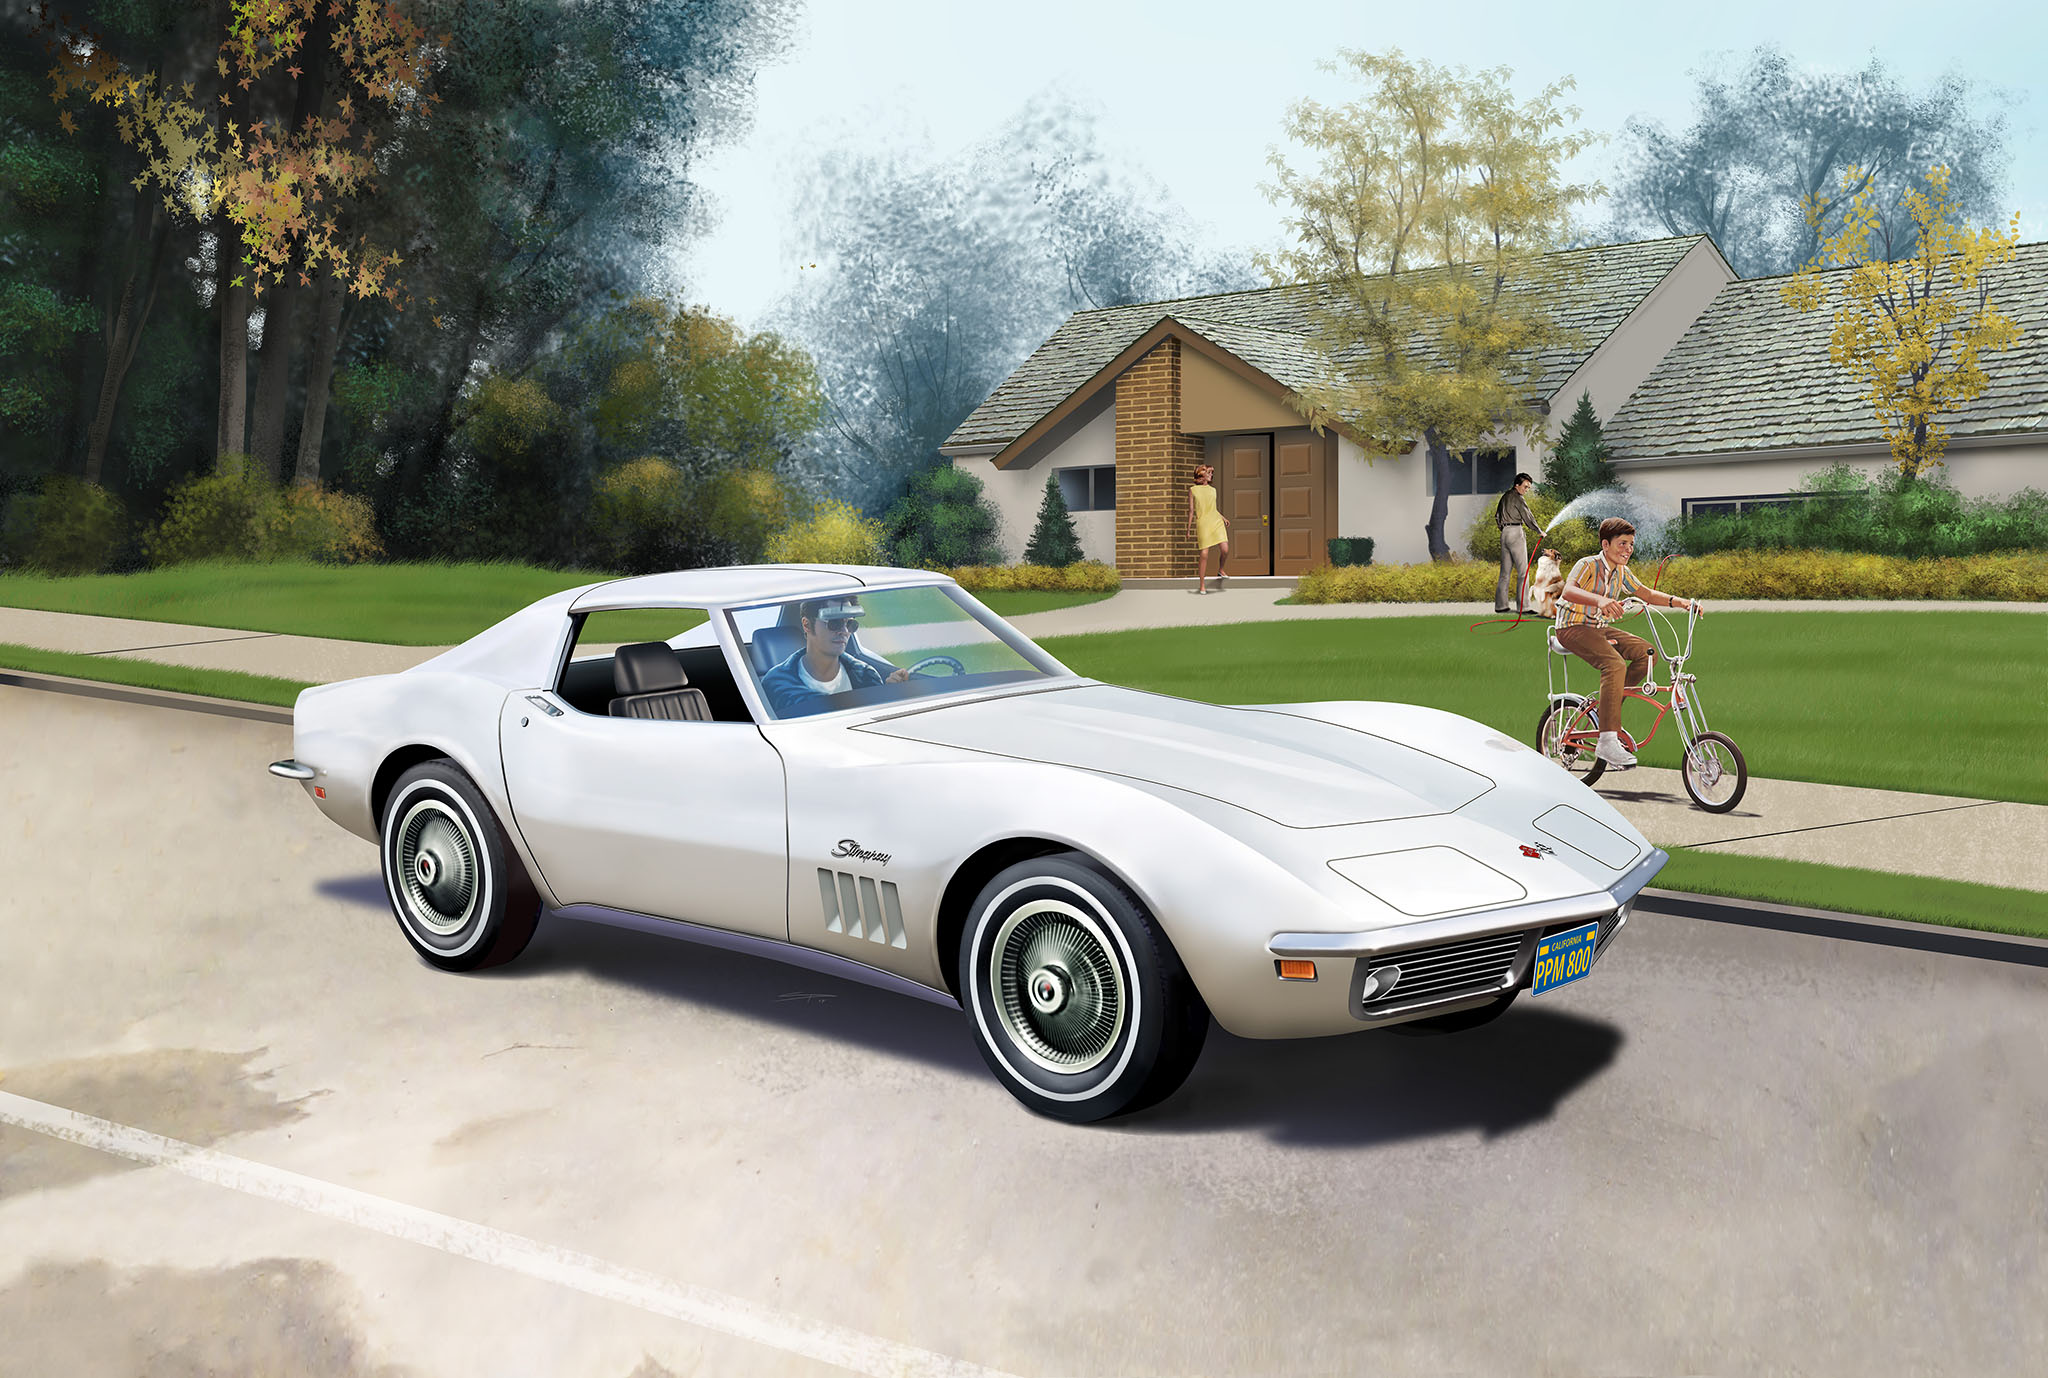 revell shop model set corvette c3 revell shop. Black Bedroom Furniture Sets. Home Design Ideas